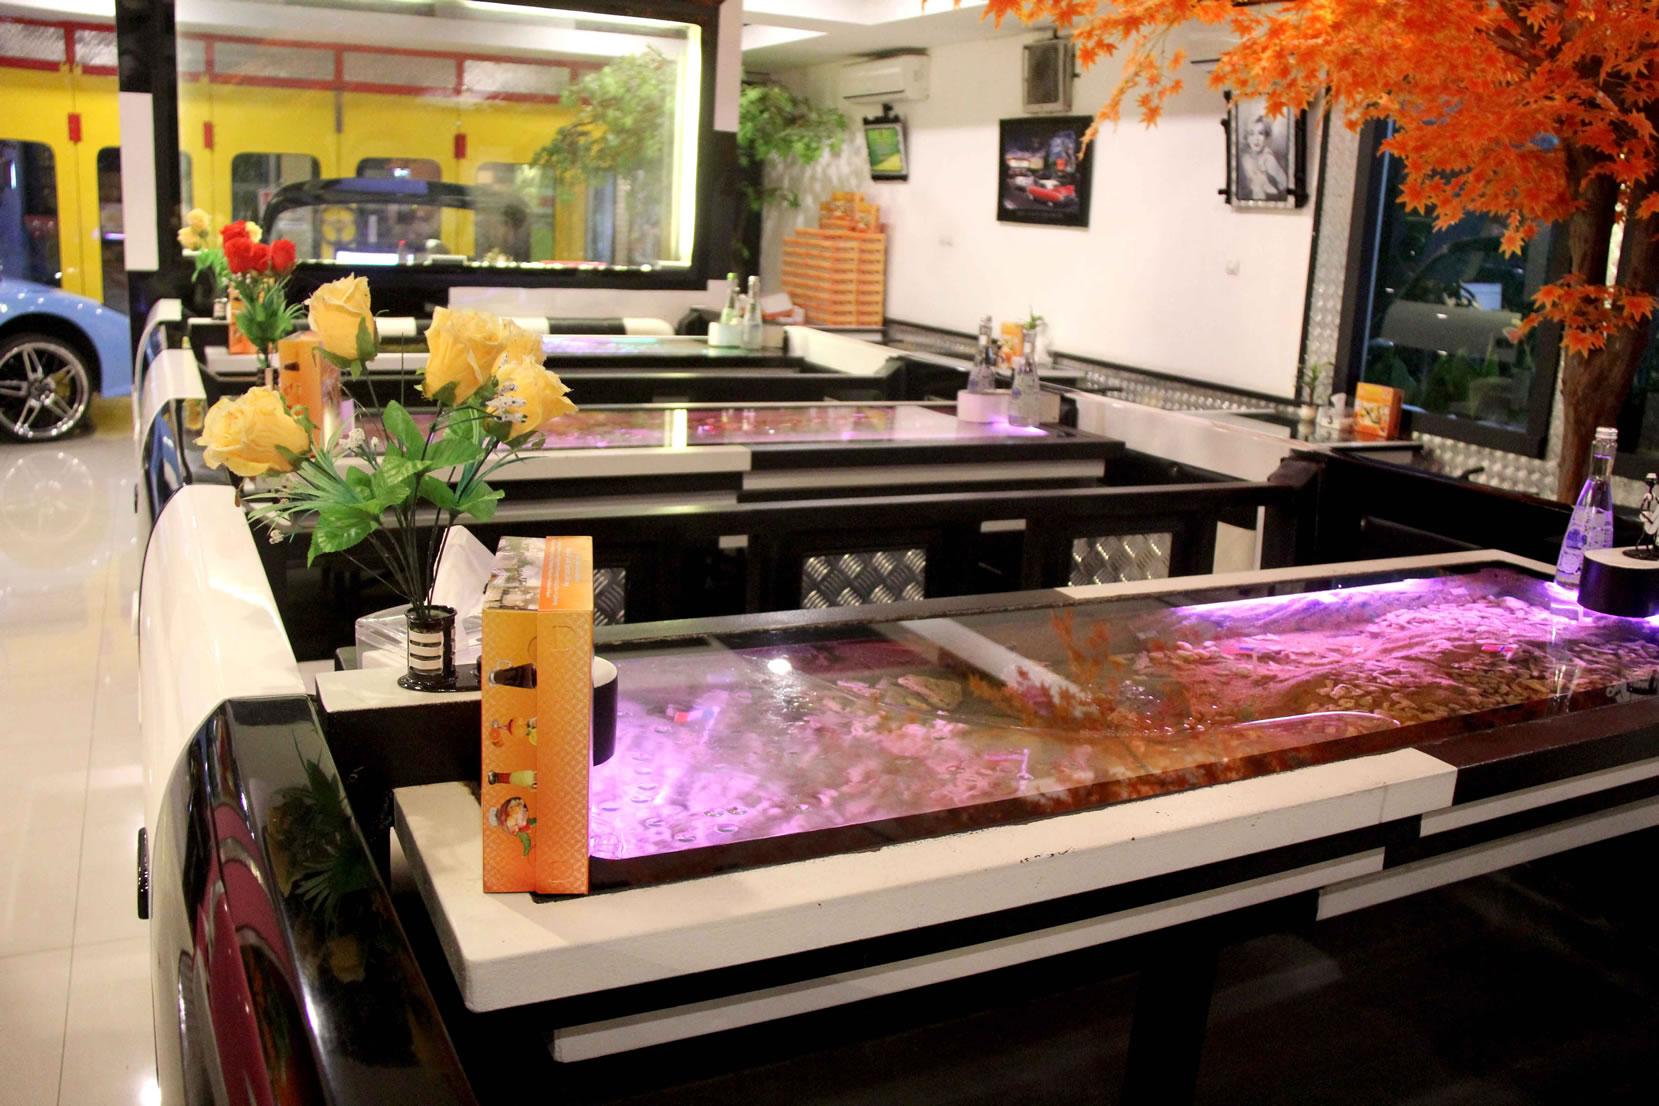 most aquarium cars in a restaurant dream cars restaurant 2 sets world record video